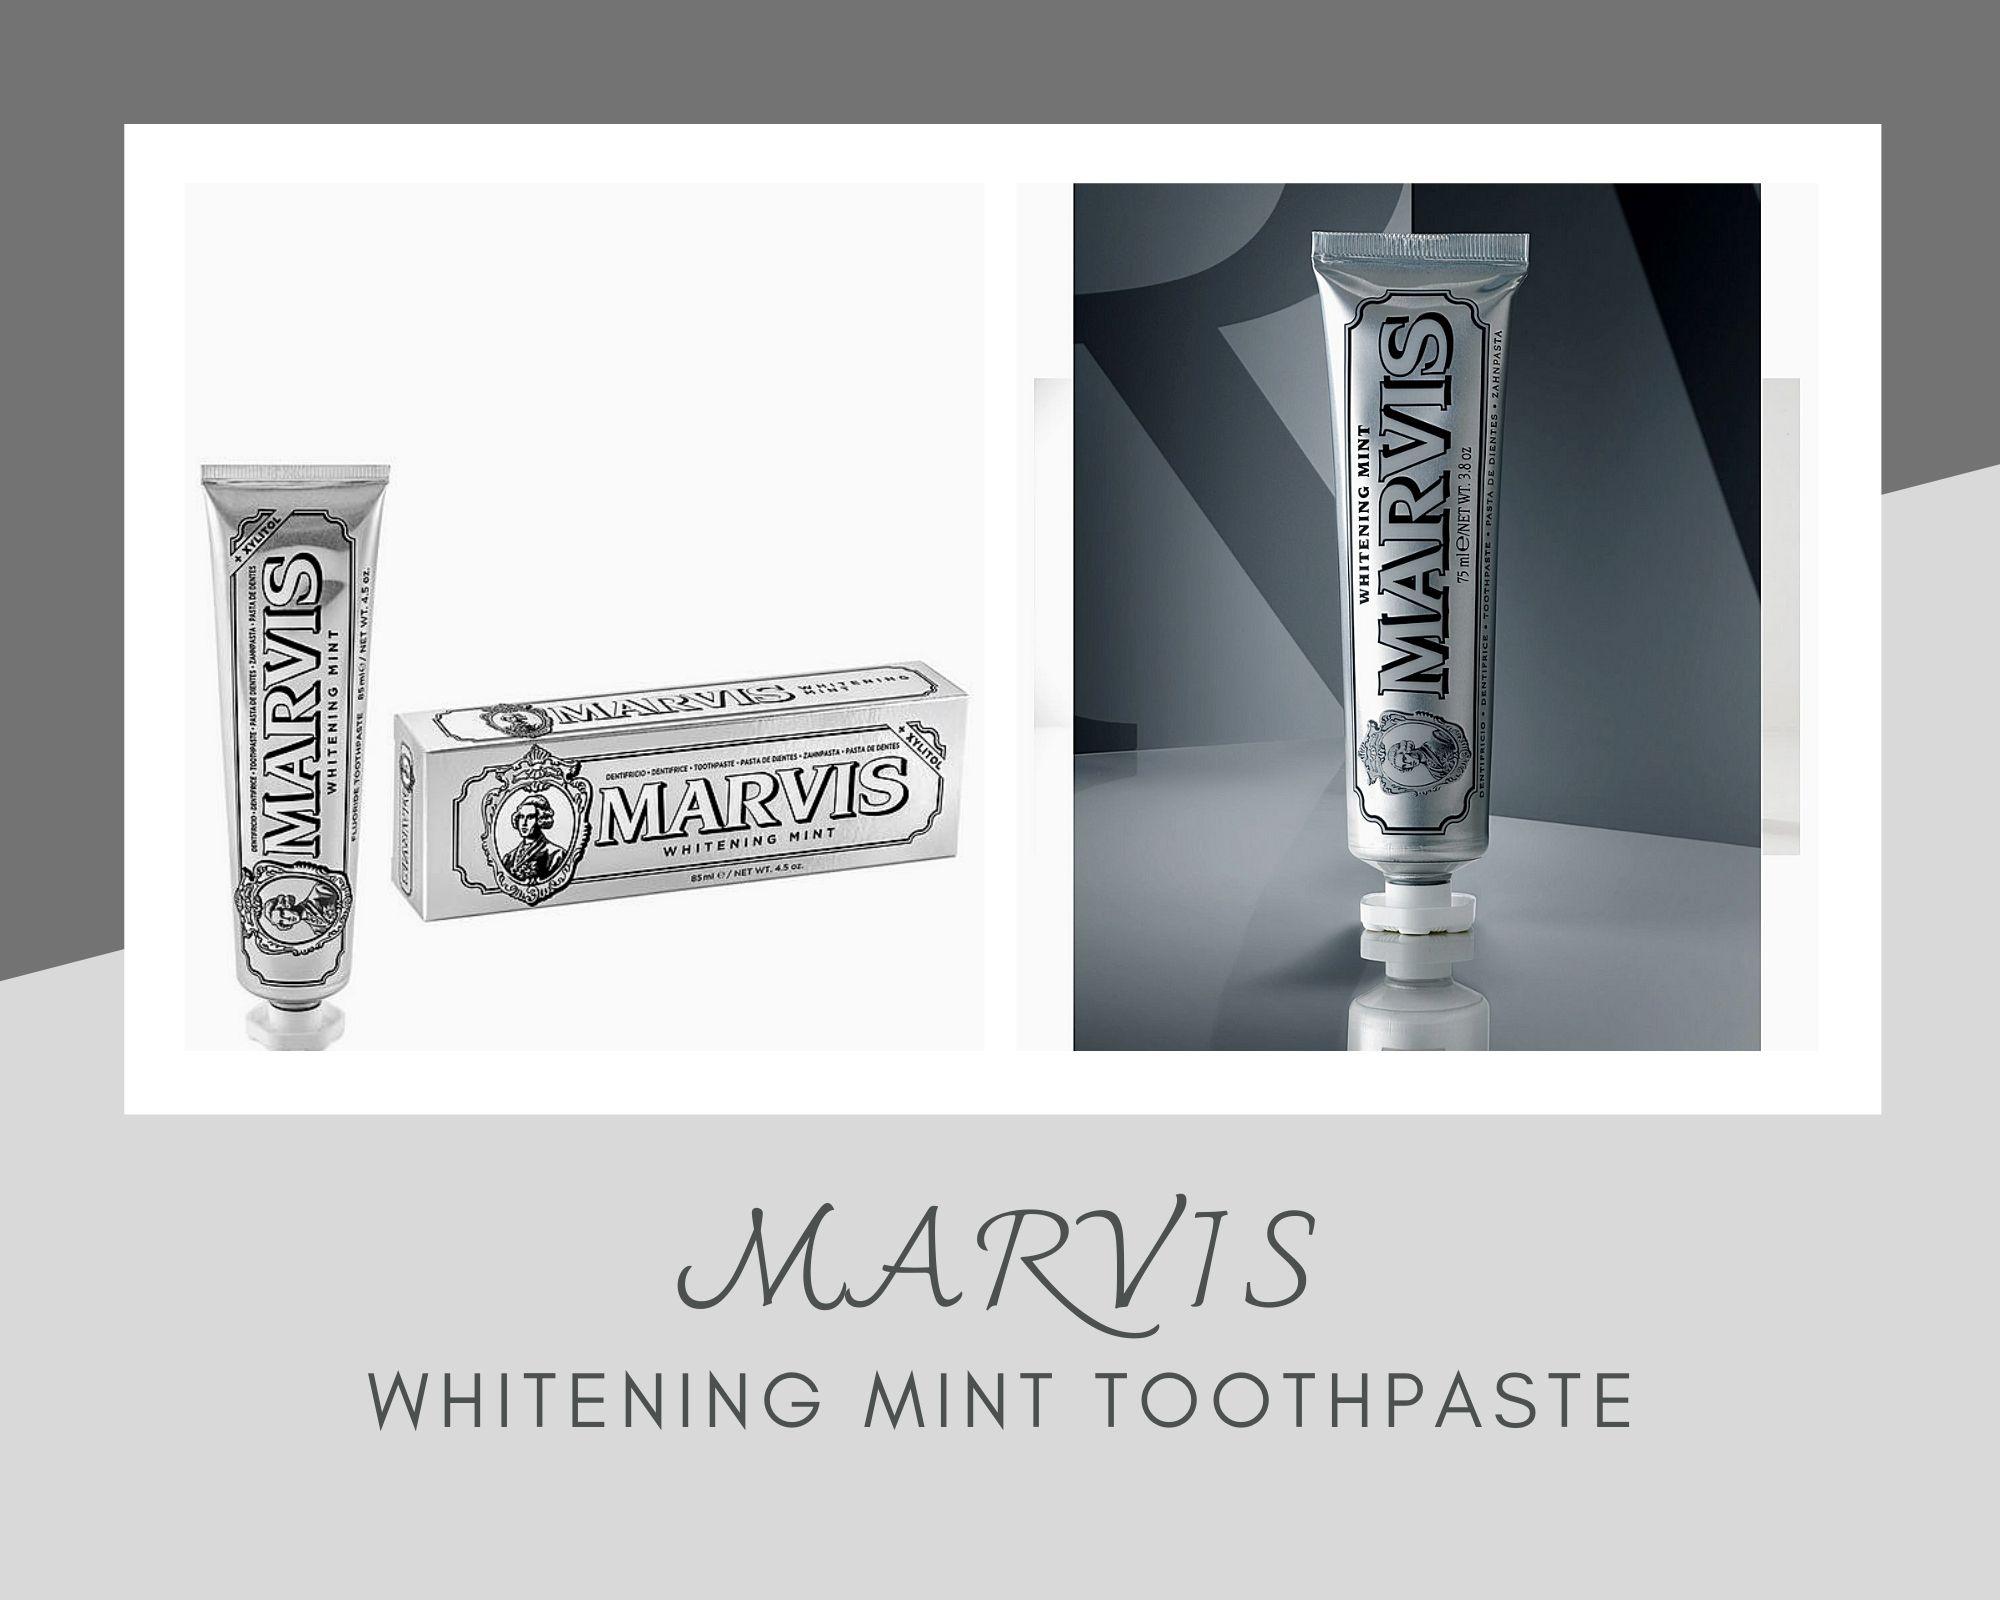 Marvis美白薄荷牙膏